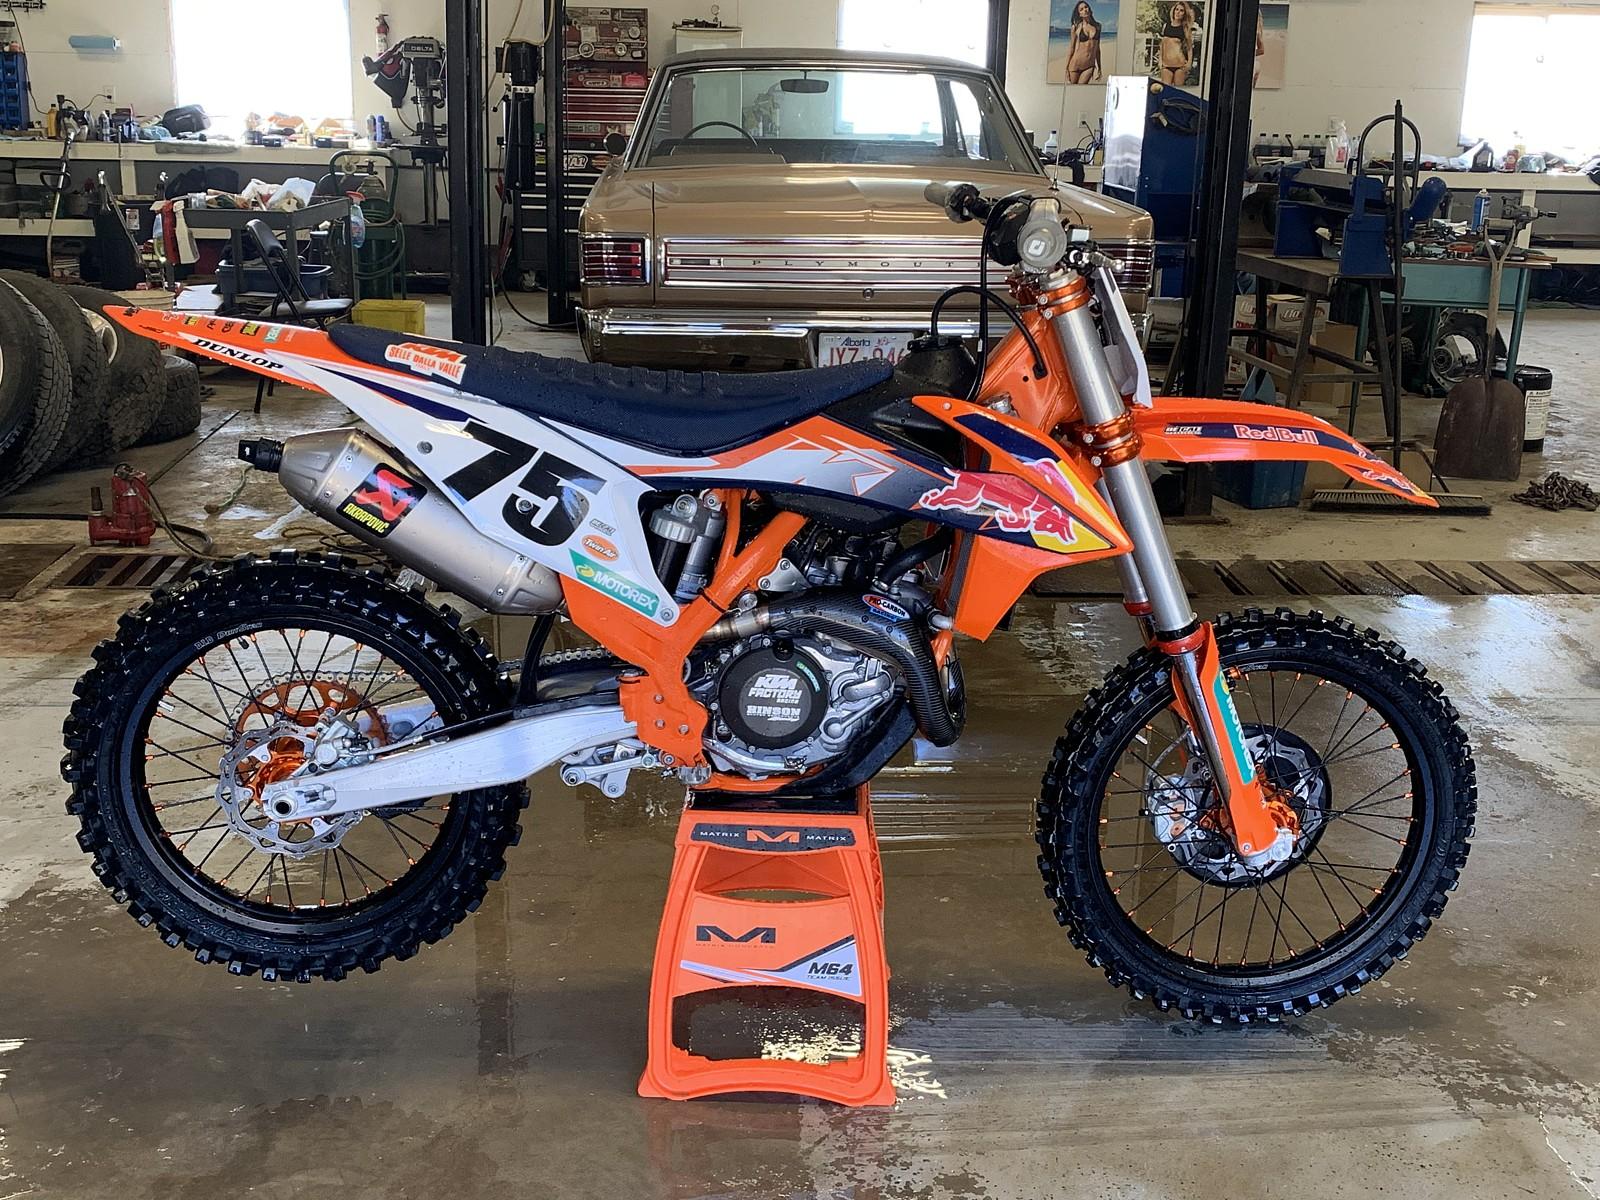 49274C85-F243-4D01-AAF4-5C990514DAA8 - whitechapel44 - Motocross Pictures - Vital MX